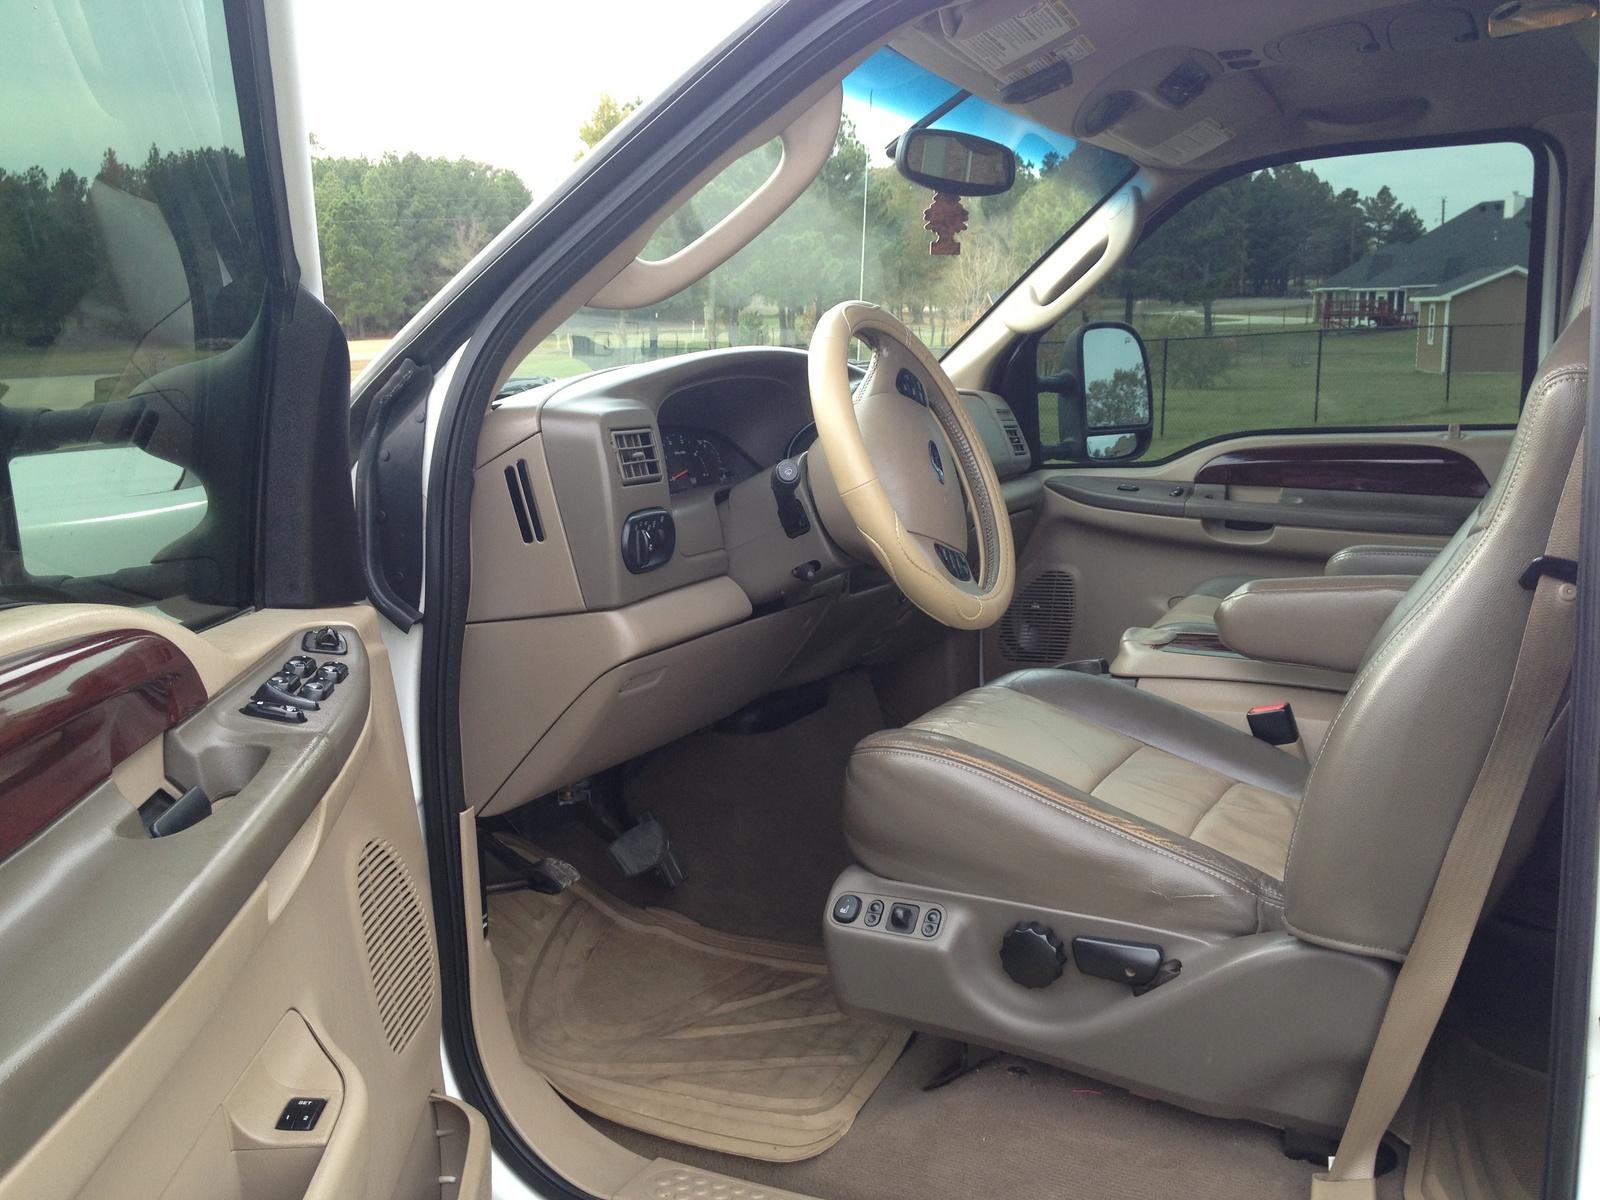 2005 Ford Excursion Interior